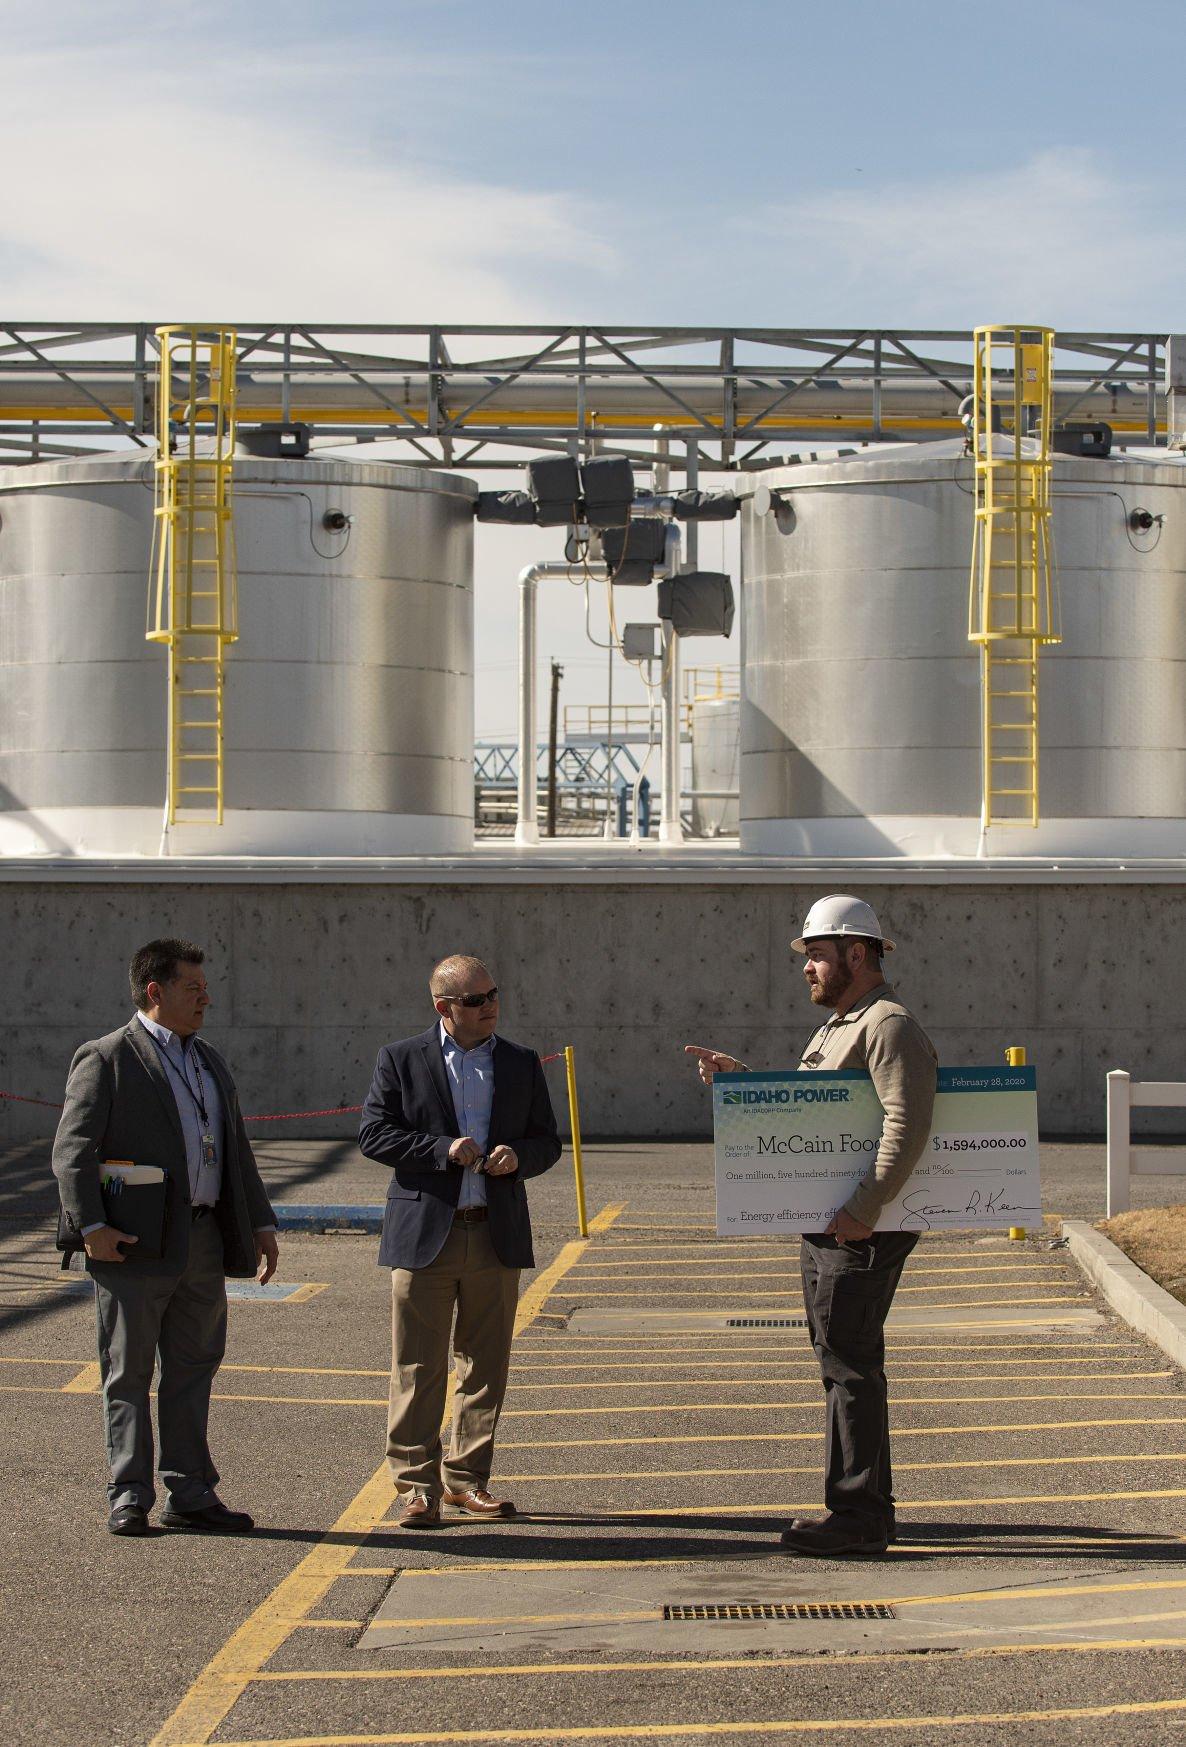 Idaho Power hooks up McCain Foods